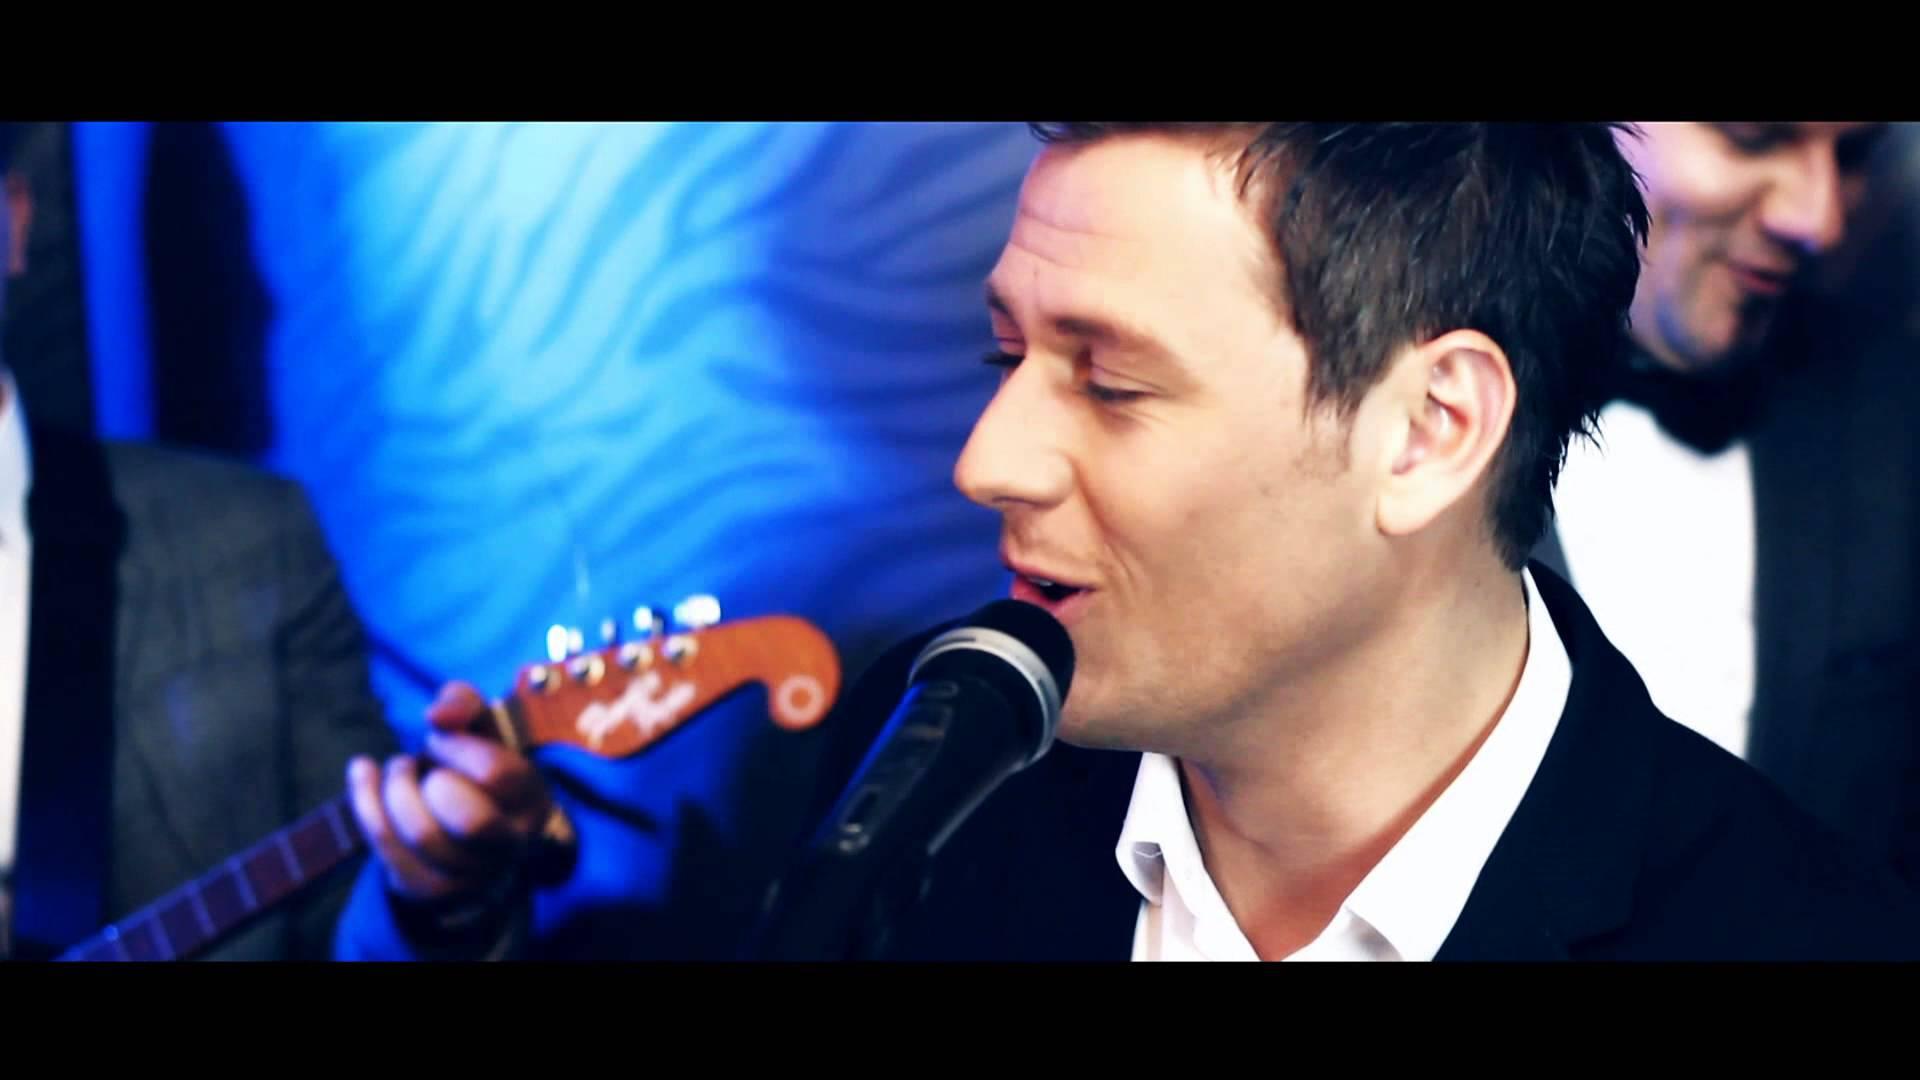 Begini & Ivan Zak - Obrisi suze (Official Video)